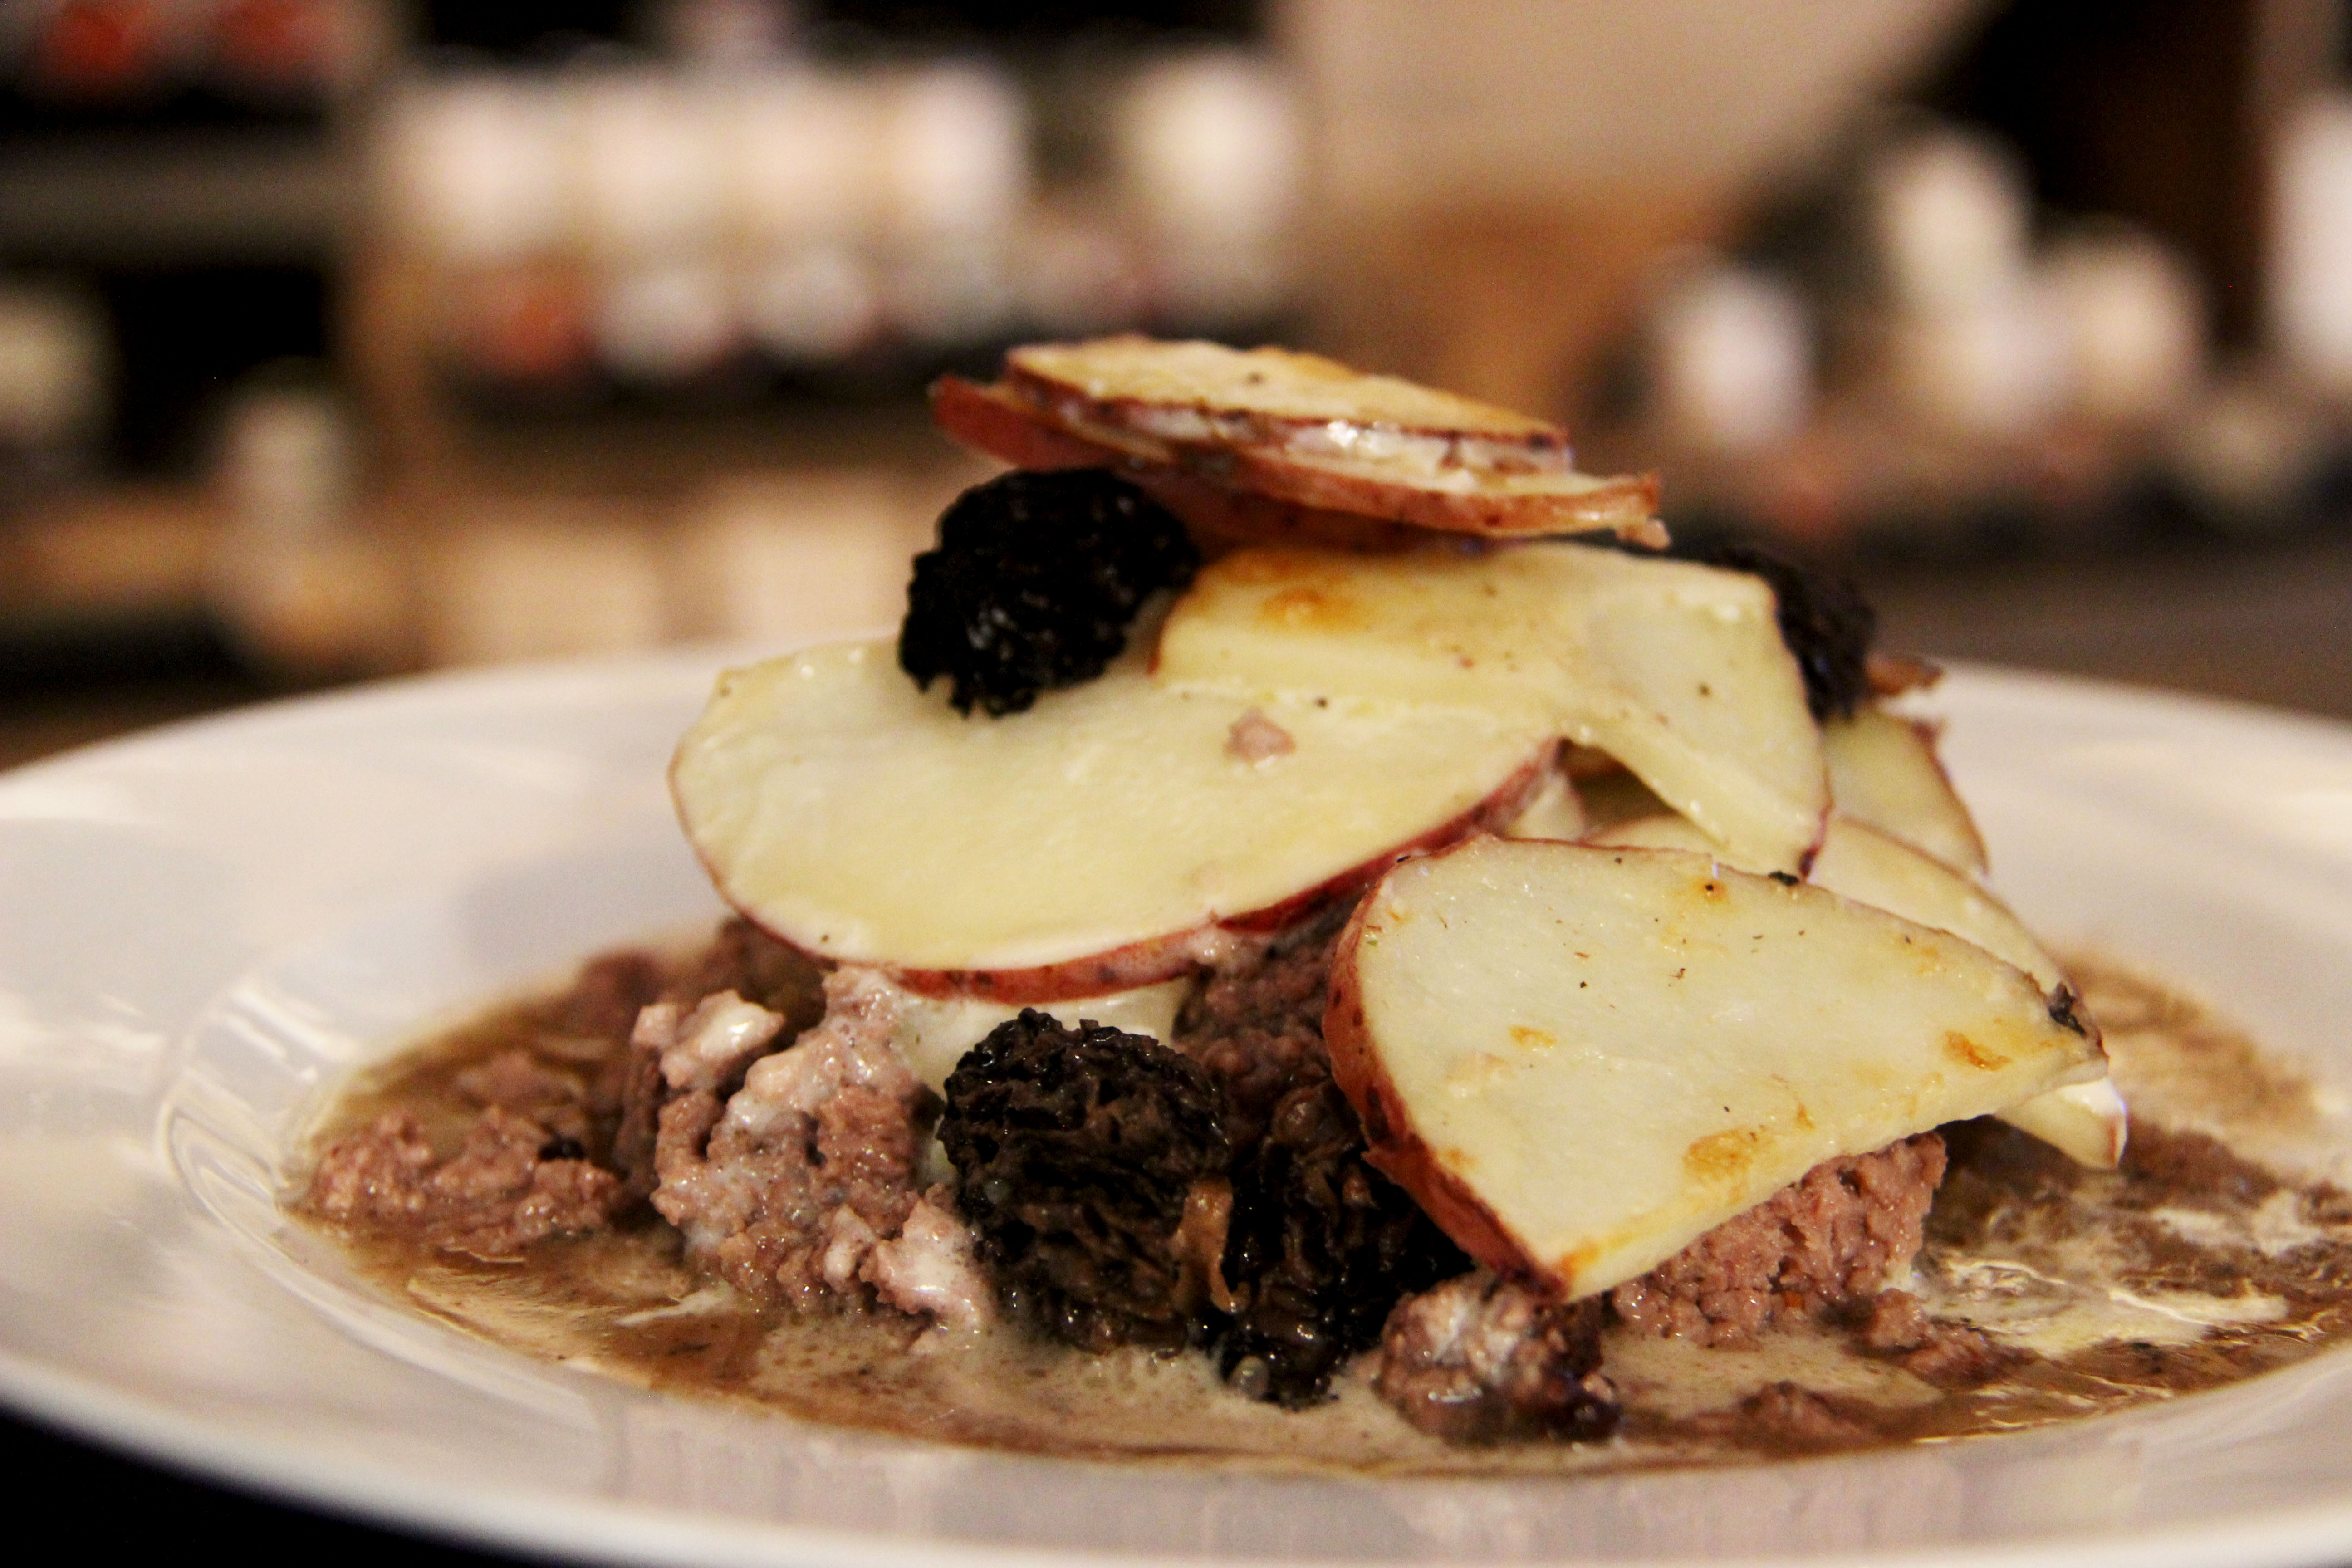 Decadant cottage pie, creamy scallop morels potatoes, beef, mushroom gravy and quebec trad